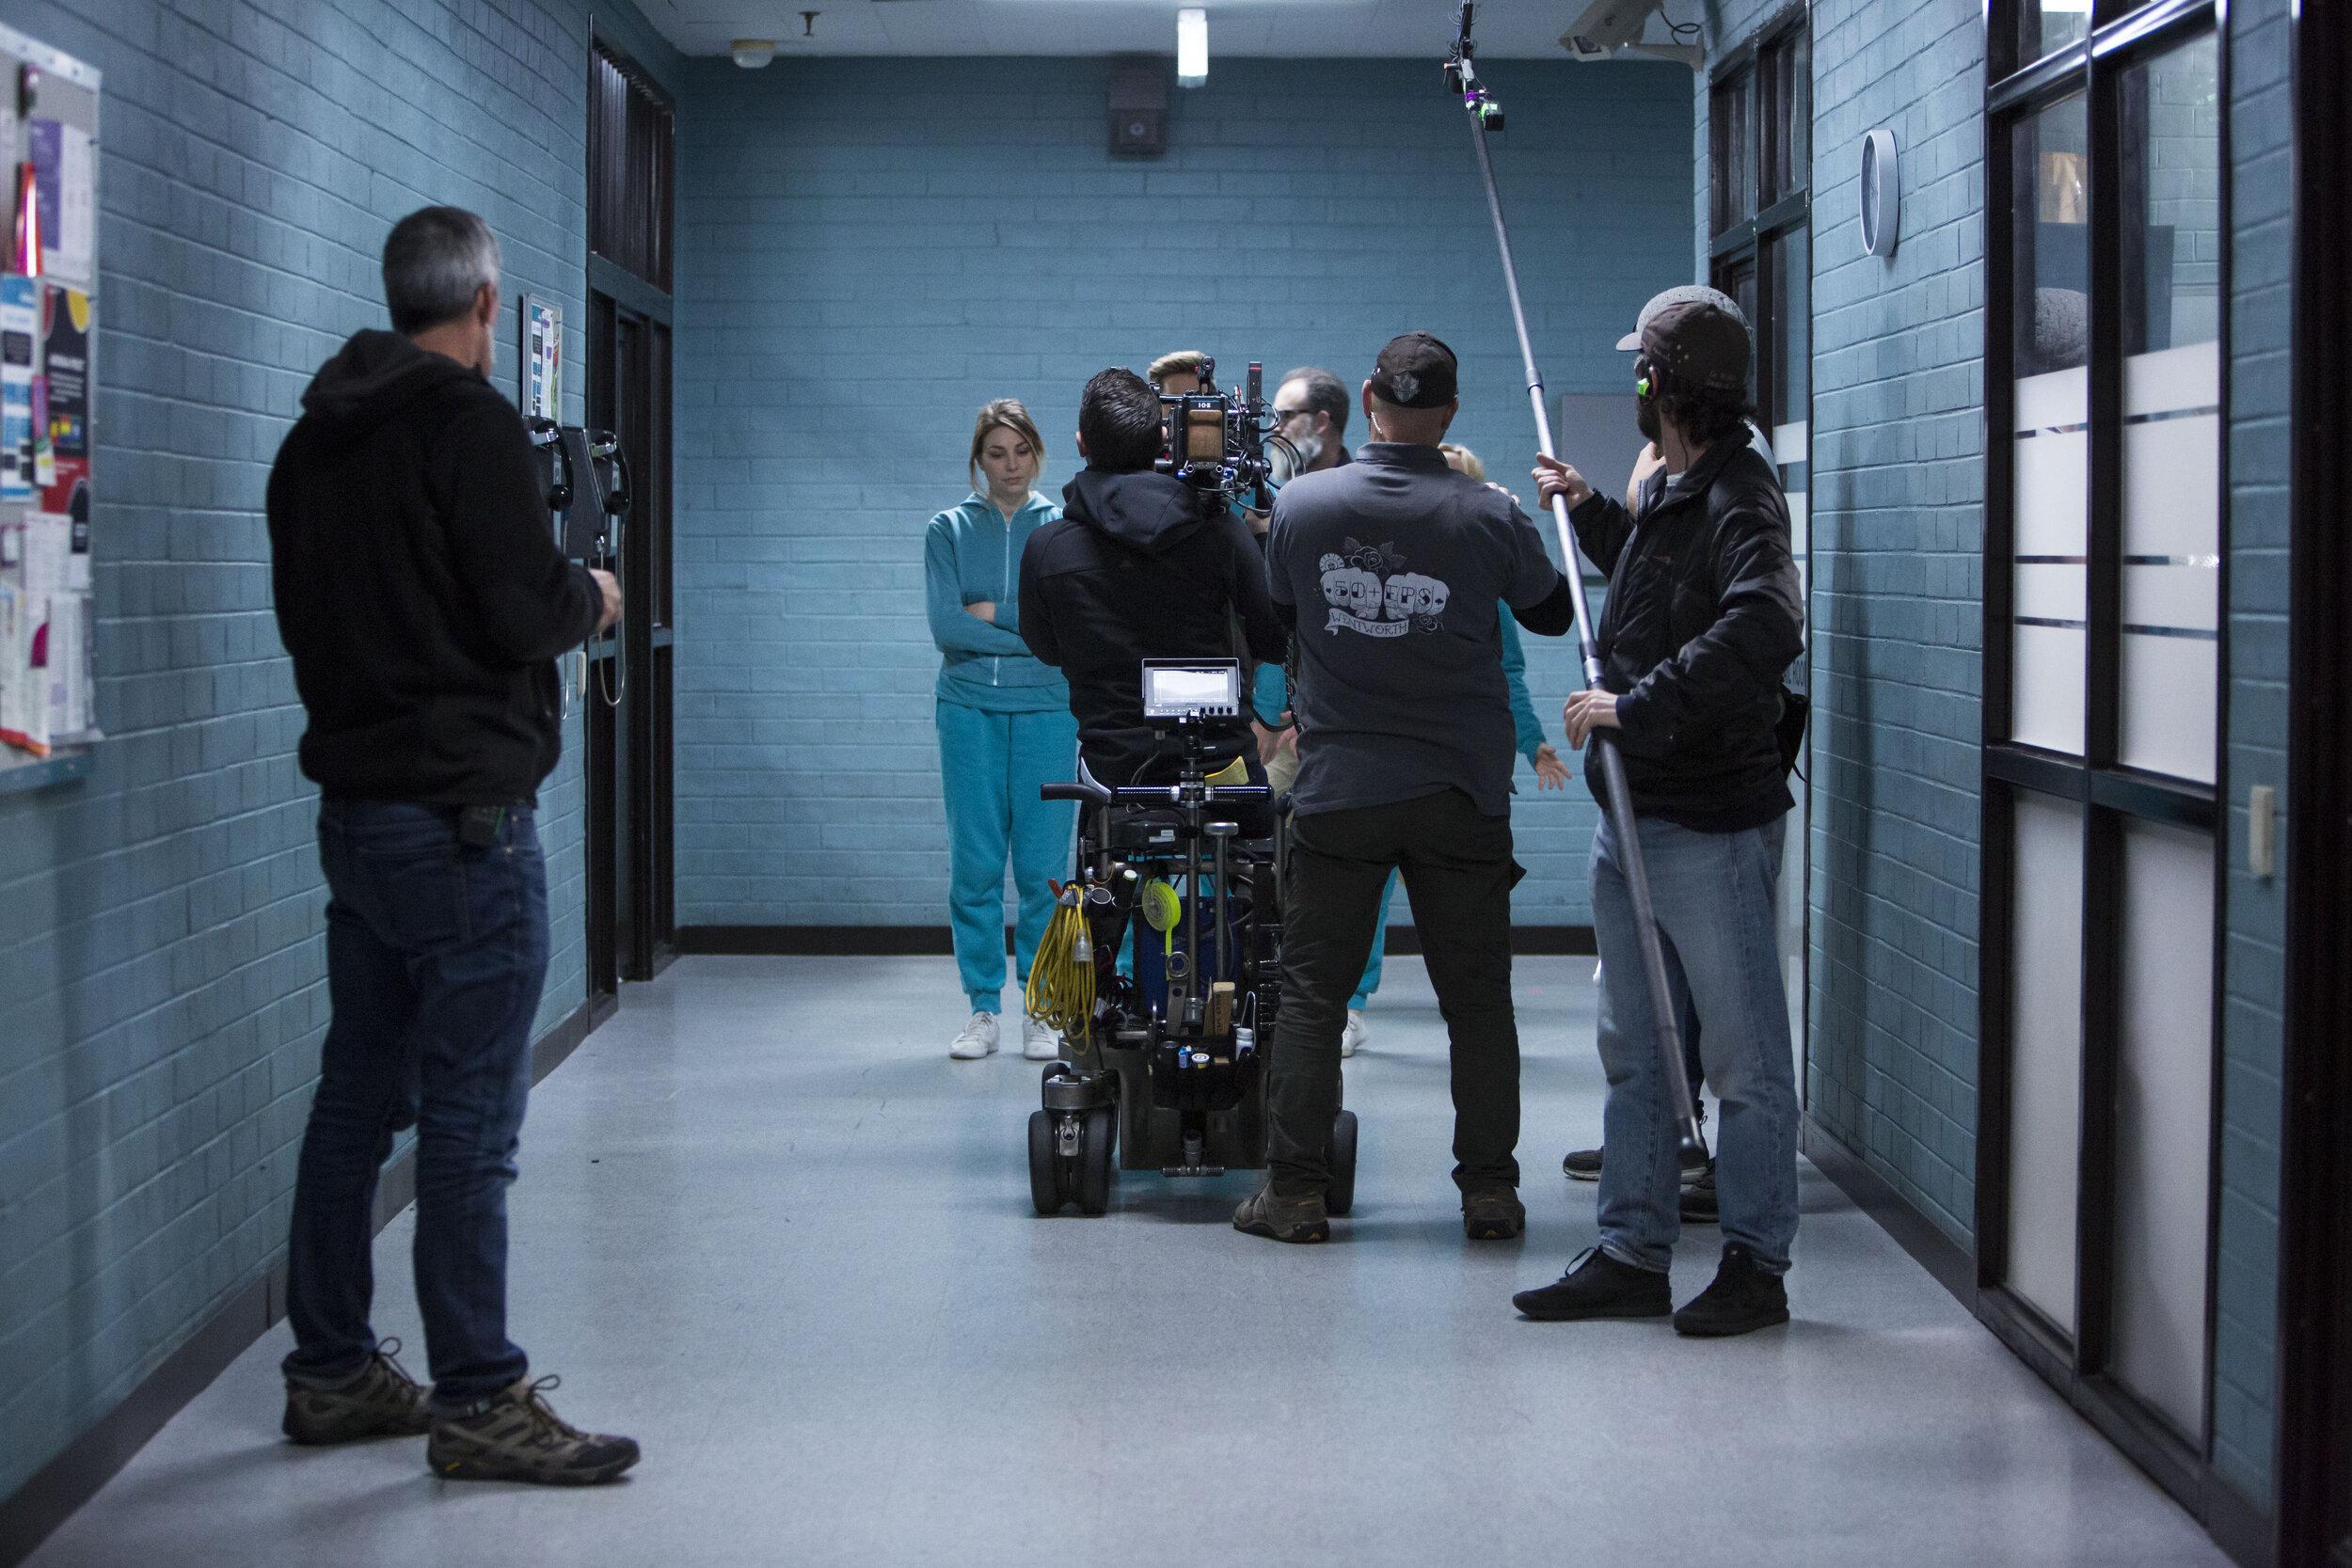 Wentworth - behind-the-scenes.jpg